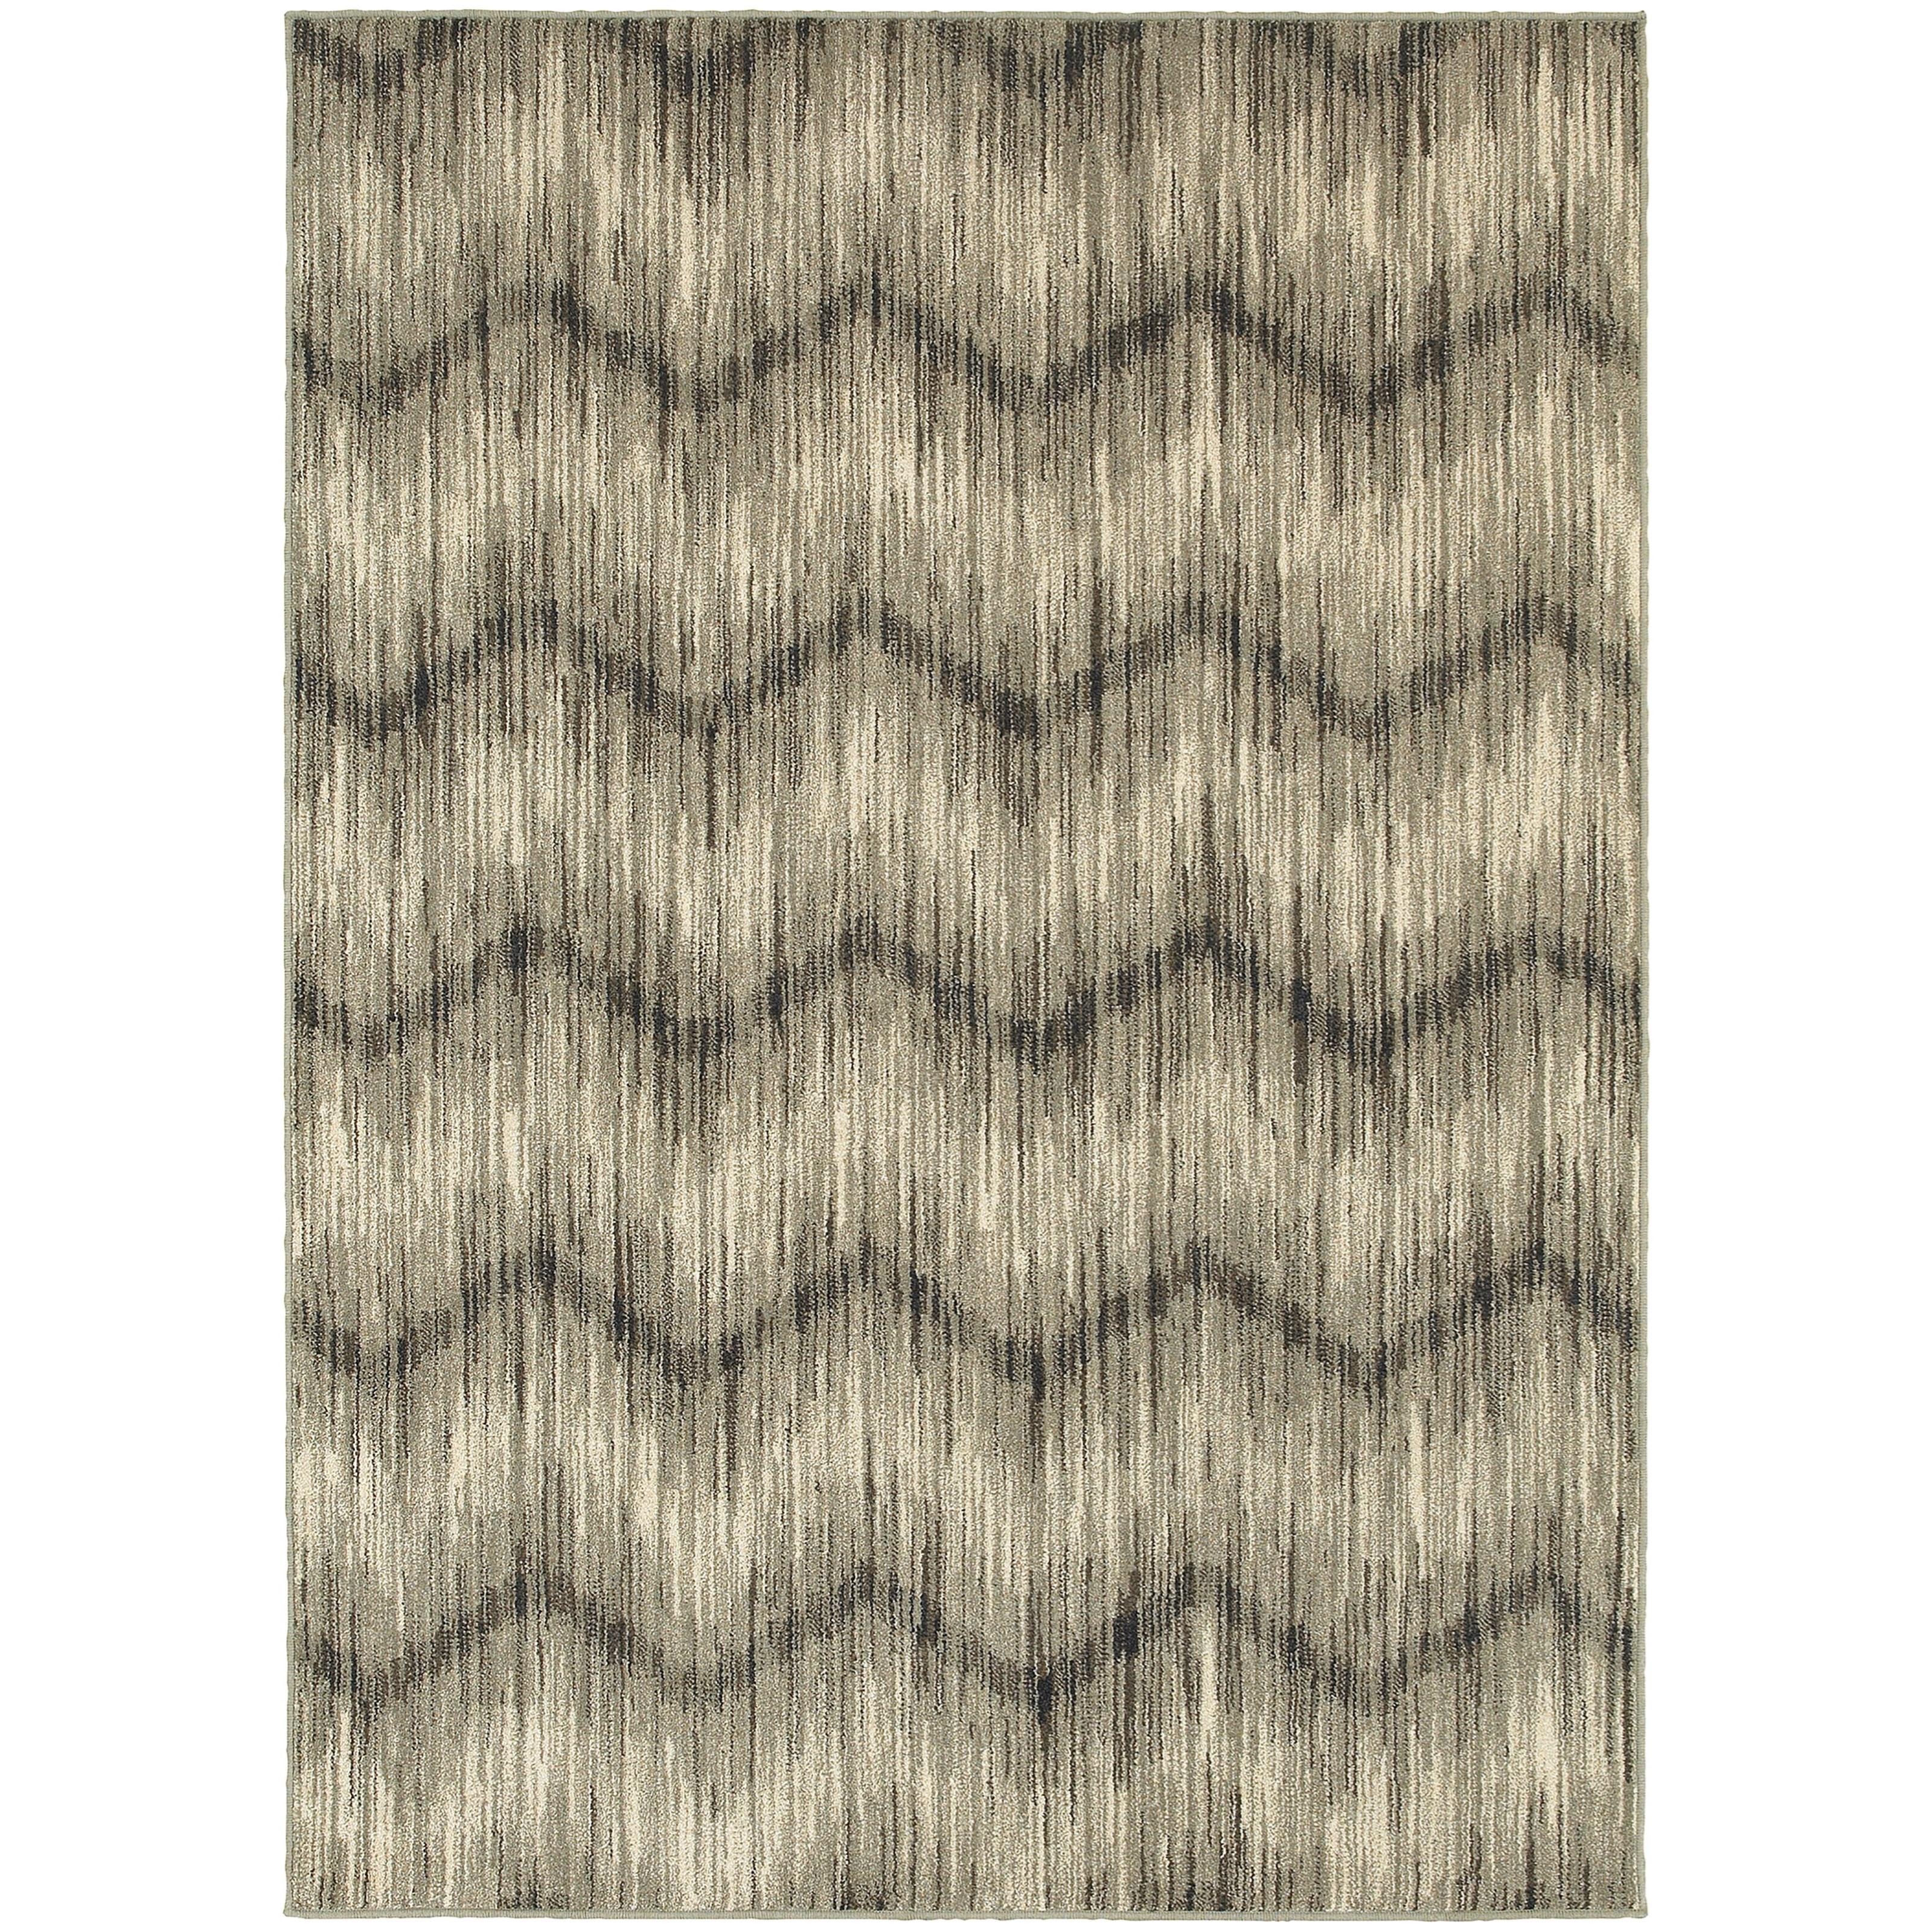 "Oriental Weavers Highlands 3'10"" X  5' 5"" Rectangle Area Rug - Item Number: HIG6608A310X55"